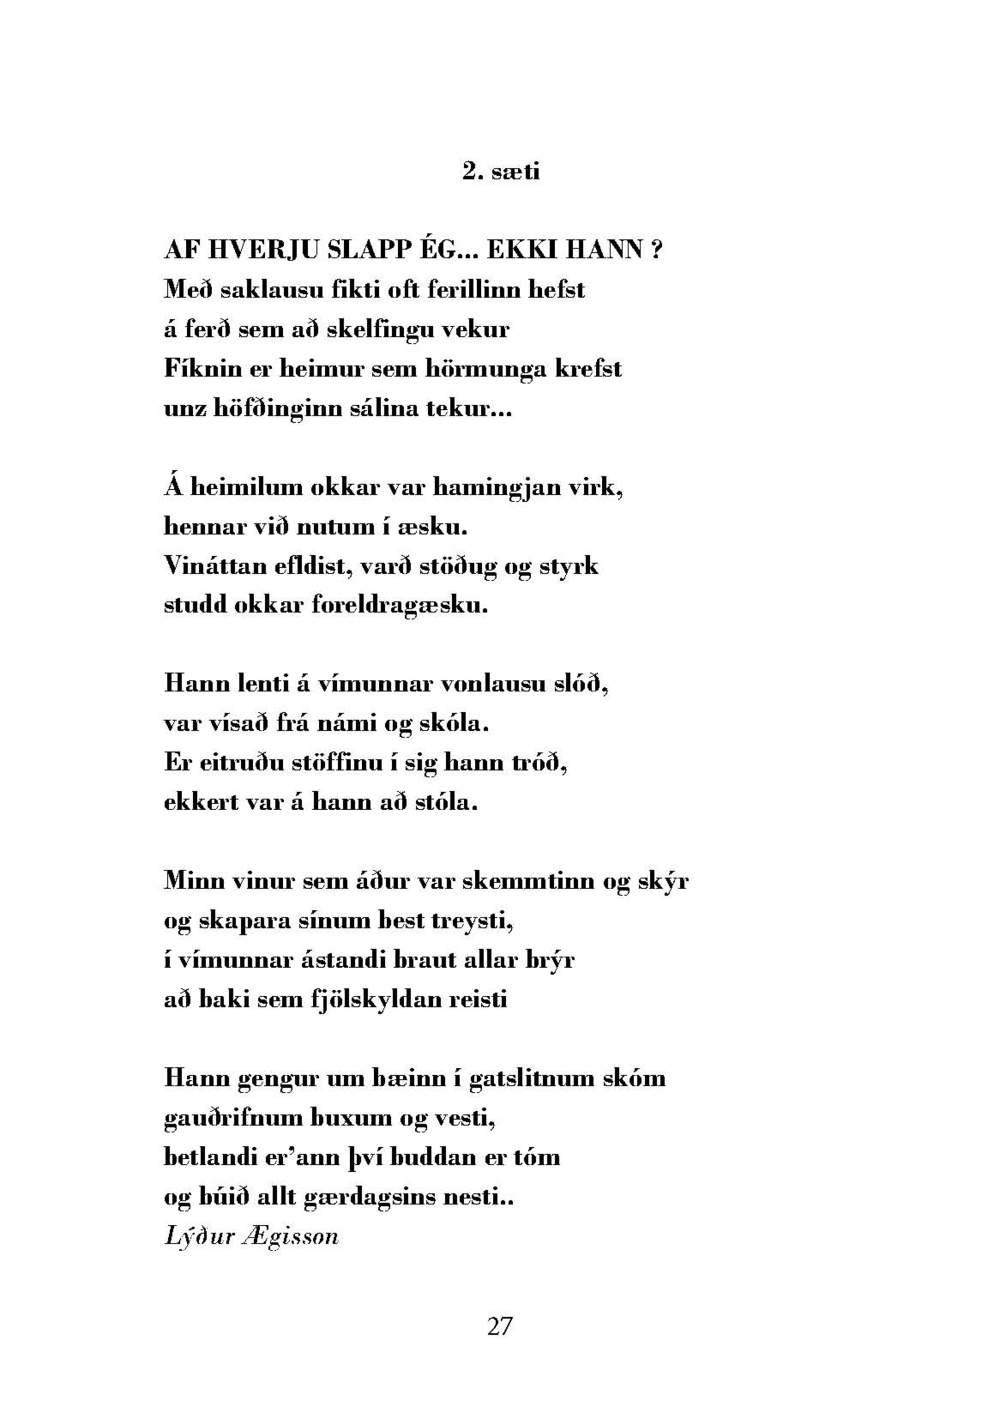 27073-ljodabokin--oll_Page_61.jpg